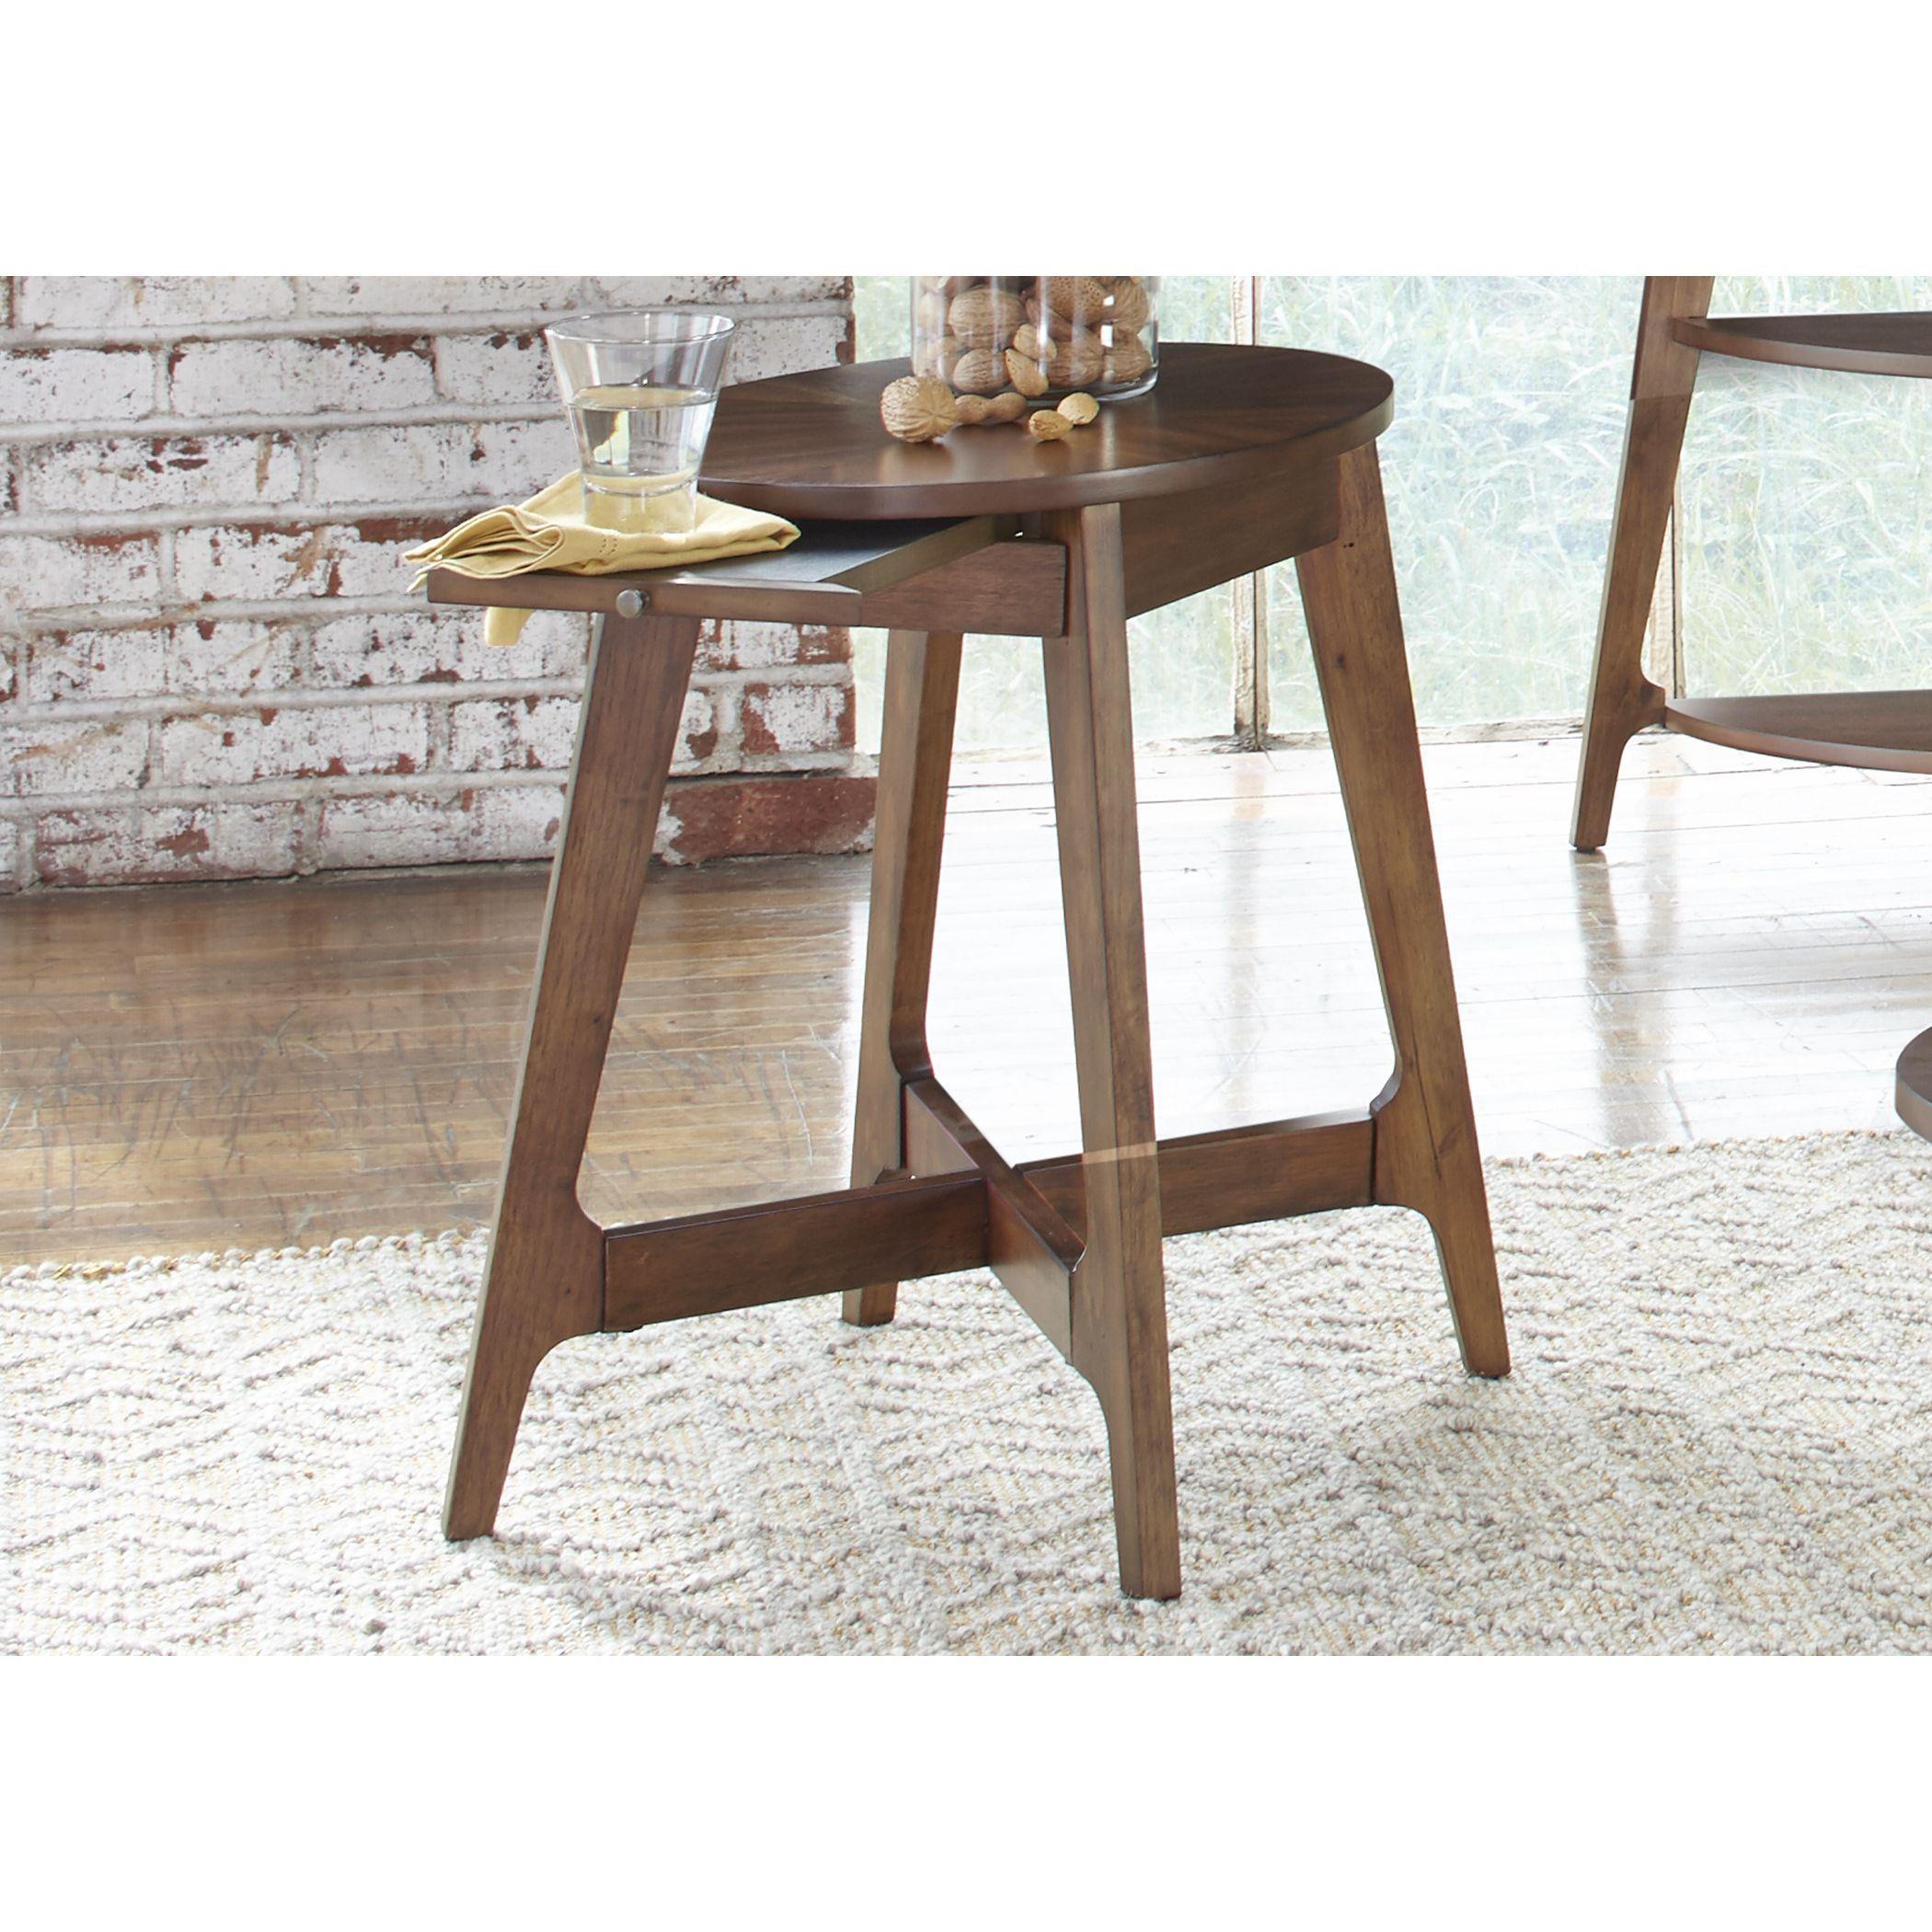 Liberty landon dark blonde modern chair side table landon dark